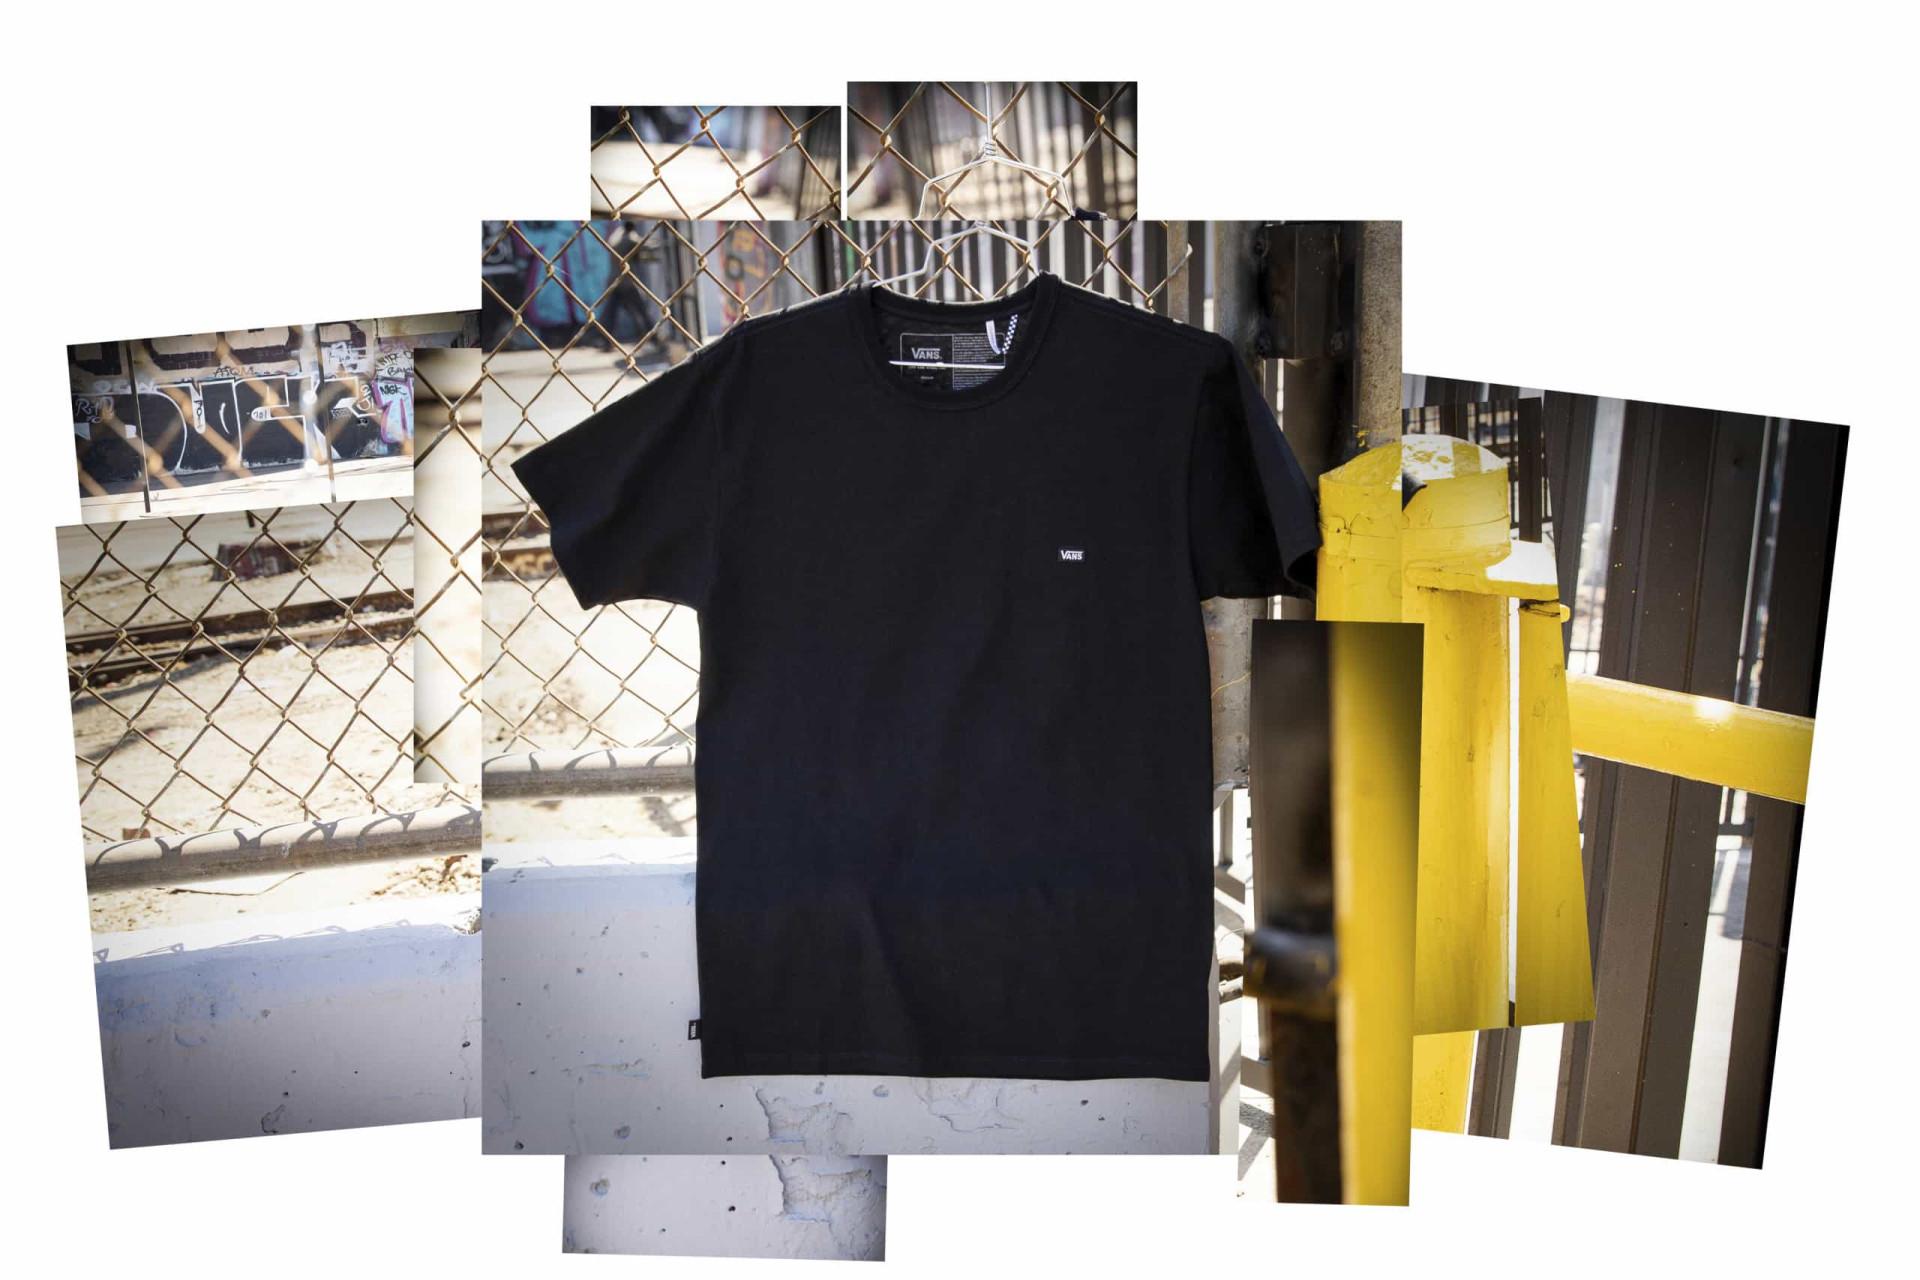 Básico Vans de todos os dias - A T-Shirt Off The Wall